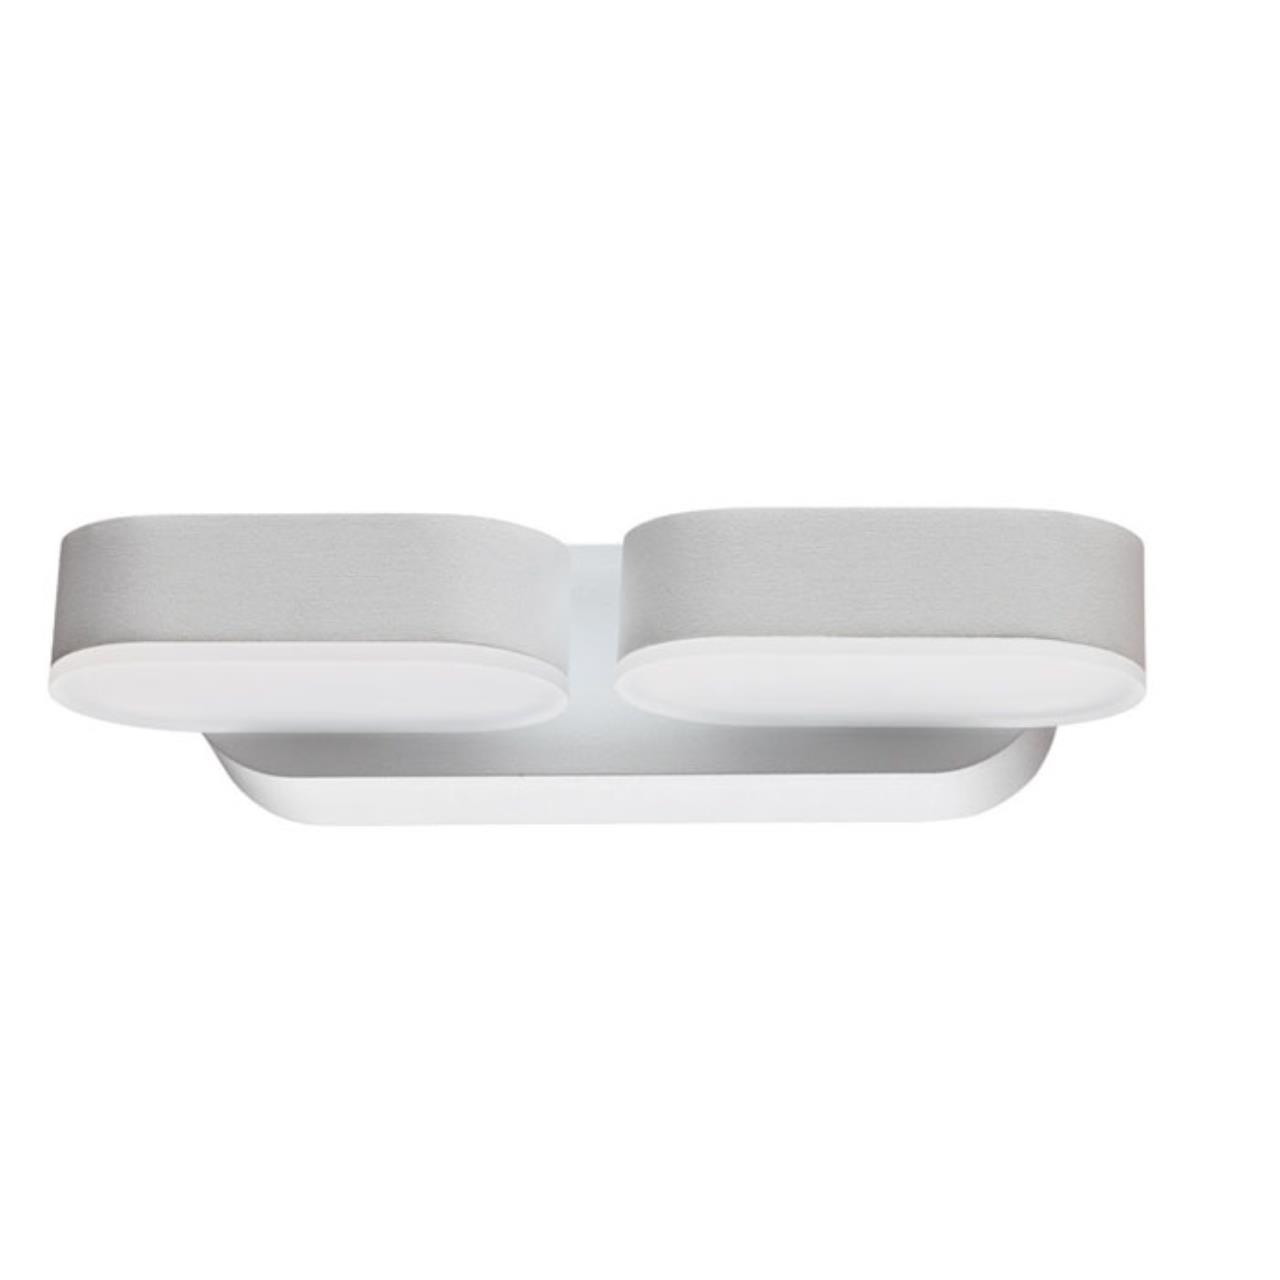 357432 STREET NT18 160 белый Ландшафтный светильник IP54 LED 3000K 12W 220-240V KAIMAS